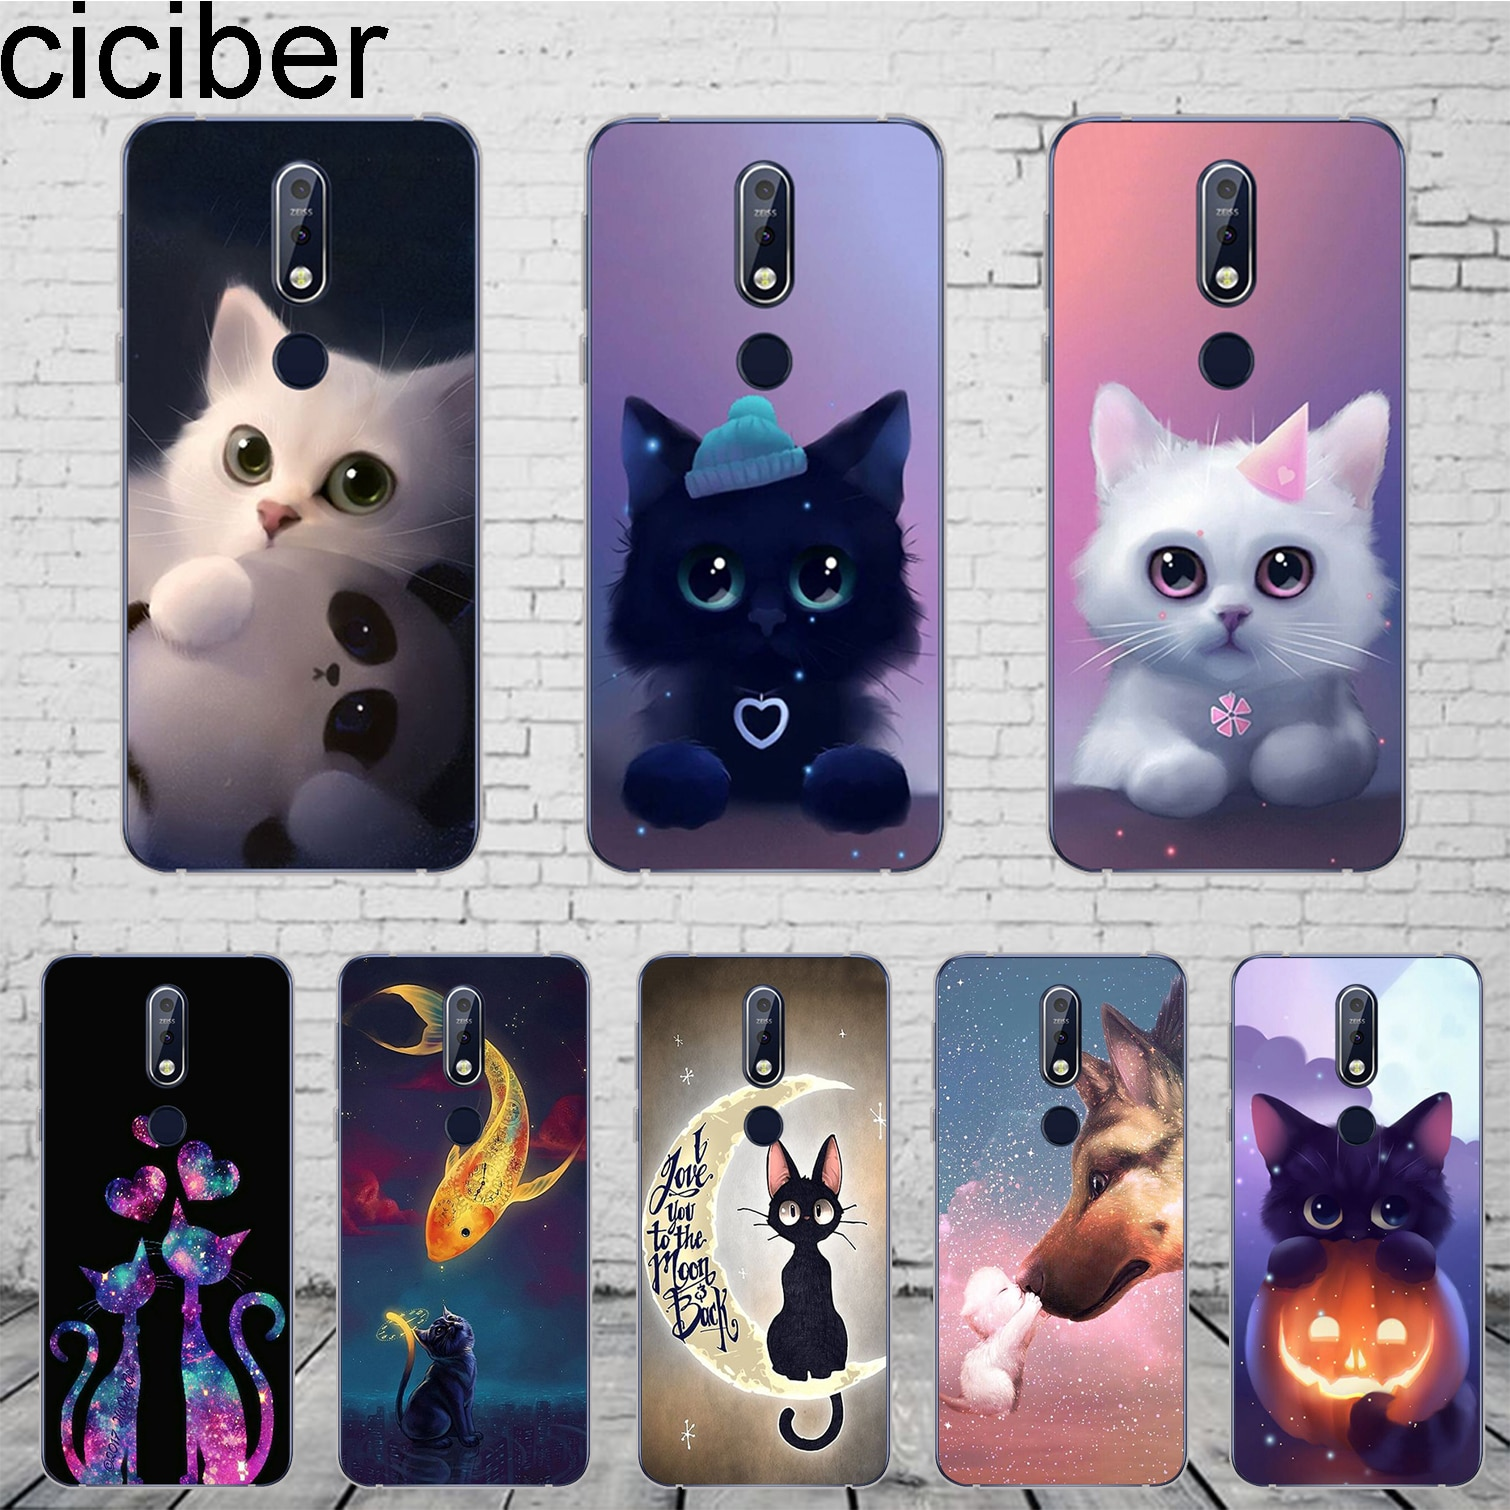 Ciciber Mignon Animal Chat Housse Pour Nokia 8 7 7.1 6 6.1 5 5.1 3 3.1 2 2 Plus 9 PureView Étui Pour Nokia X7 X6 X5 X3 TPU Souple